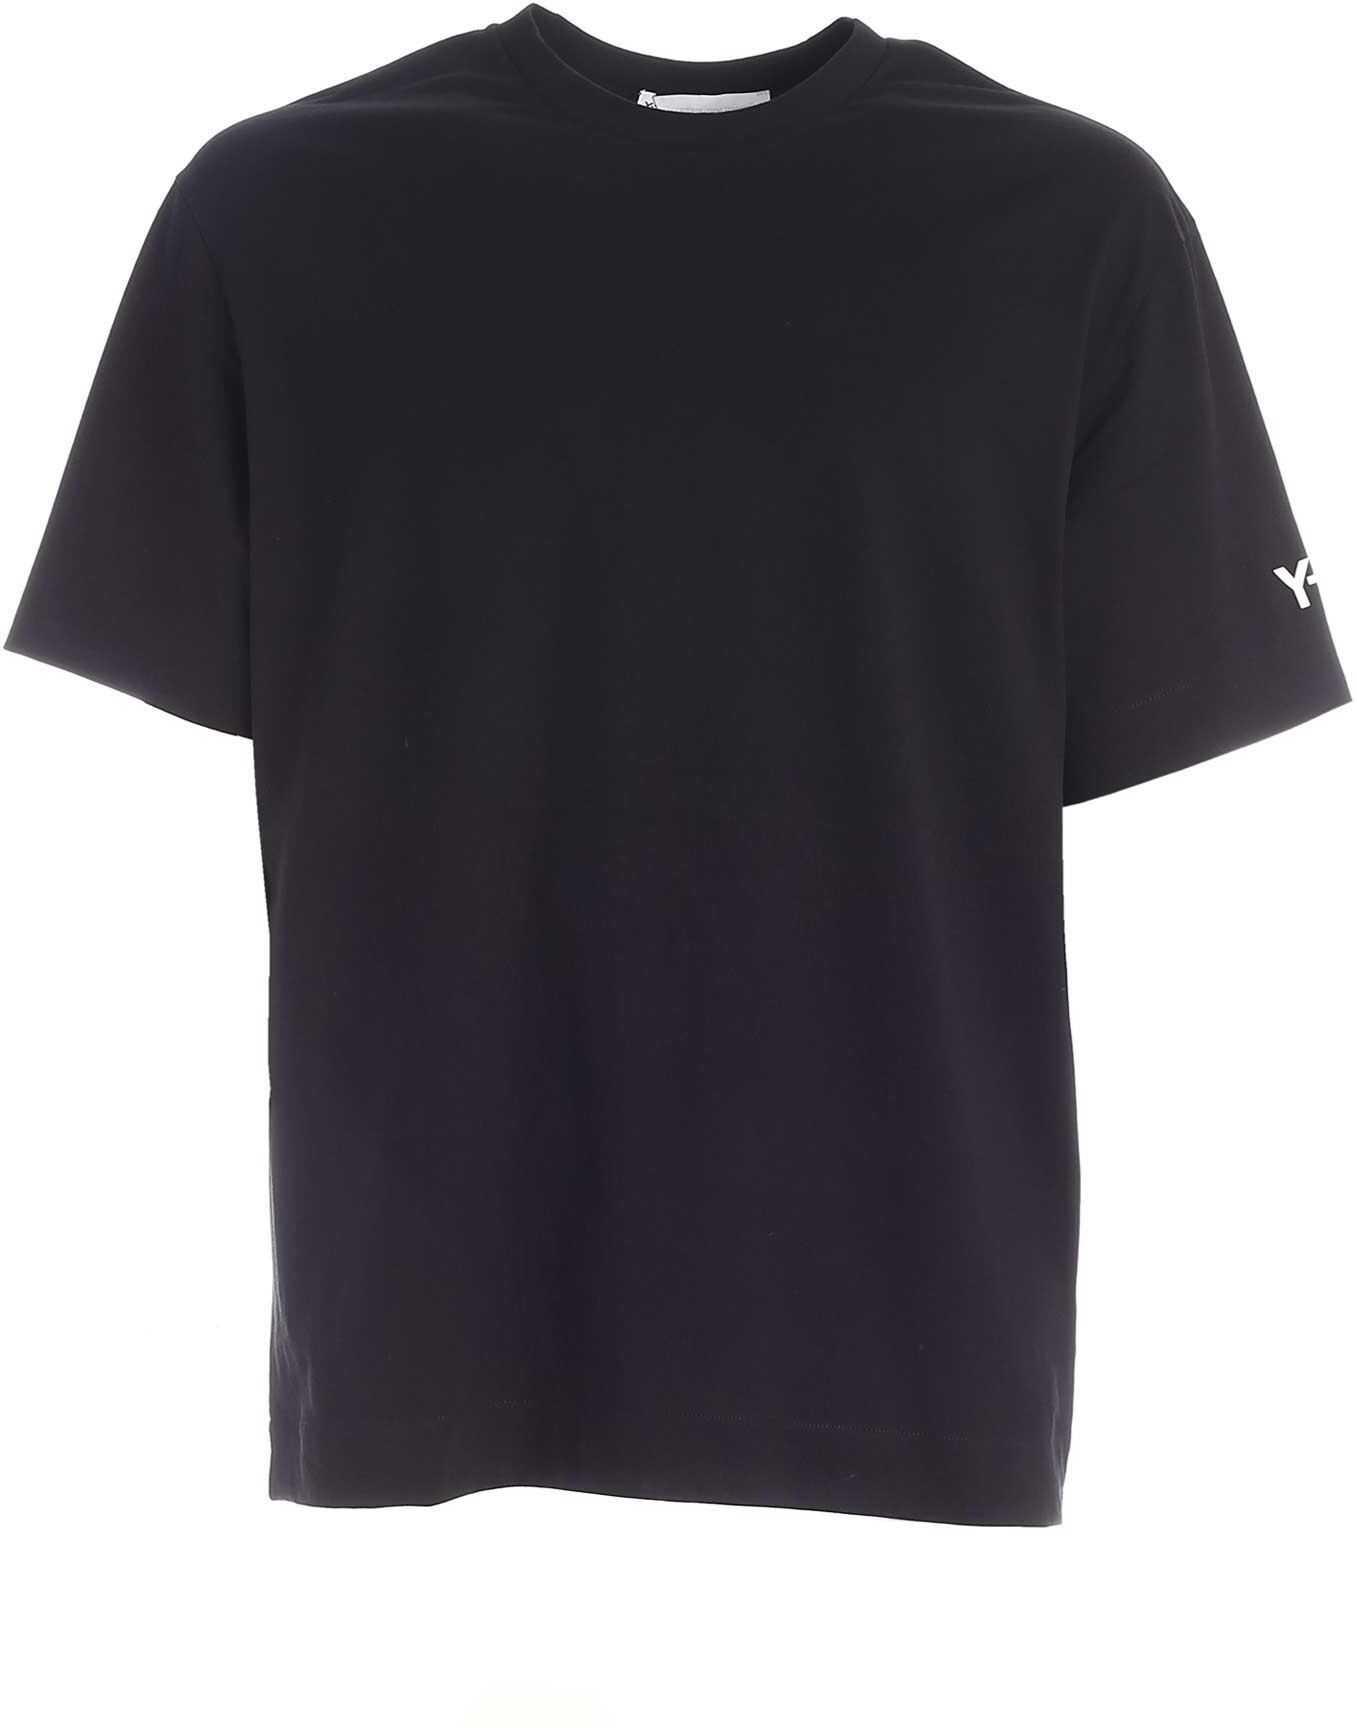 Y-3 Printed Gfx T-Shirt In Black Black